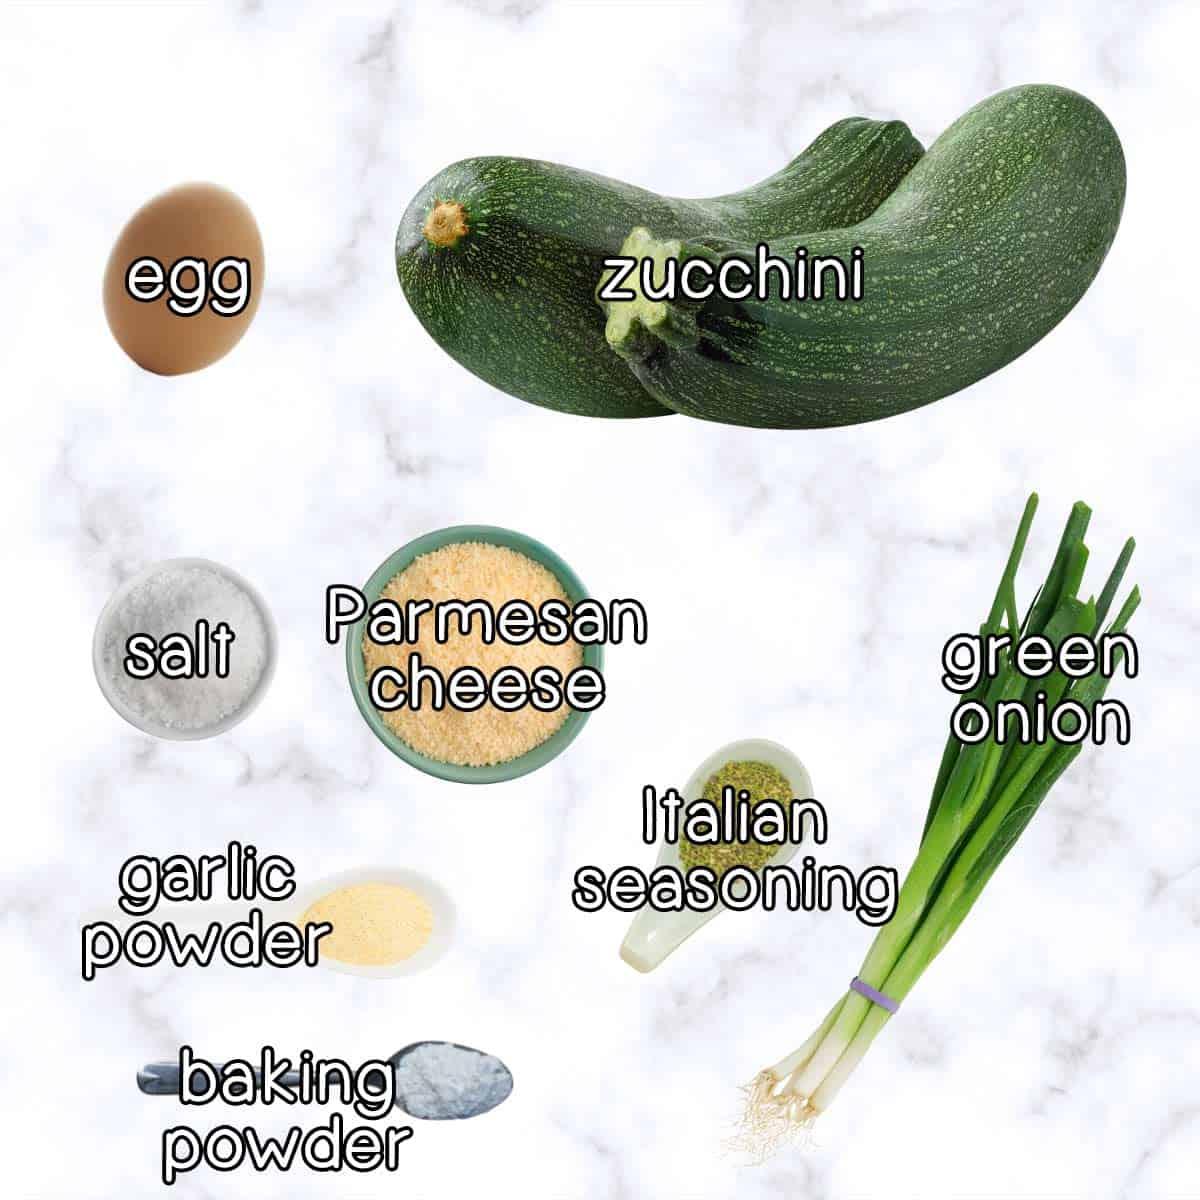 Overhead shot of ingredients- zucchini, an egg, salt, parmesan cheese, garlic powder, baking powder, Italian seasoning, and green onion.